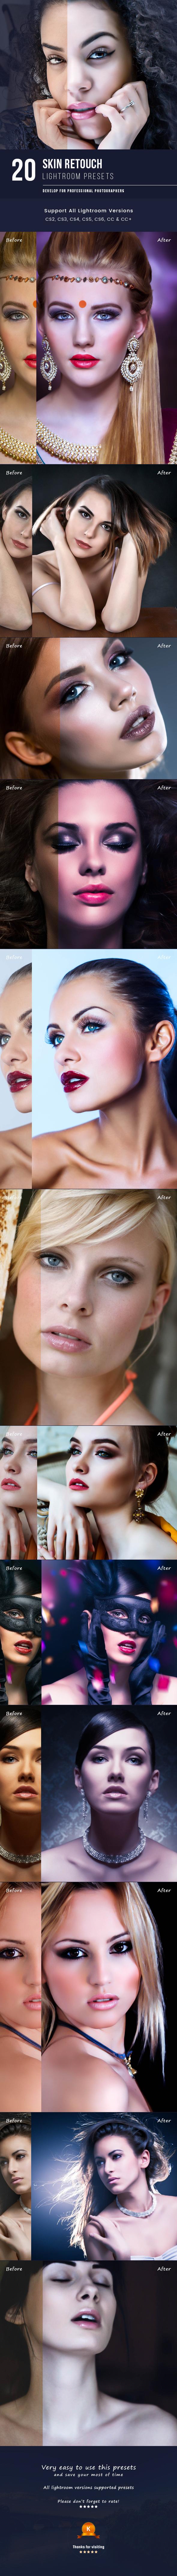 20 Skin Retouch Presets - Lightroom Presets Add-ons